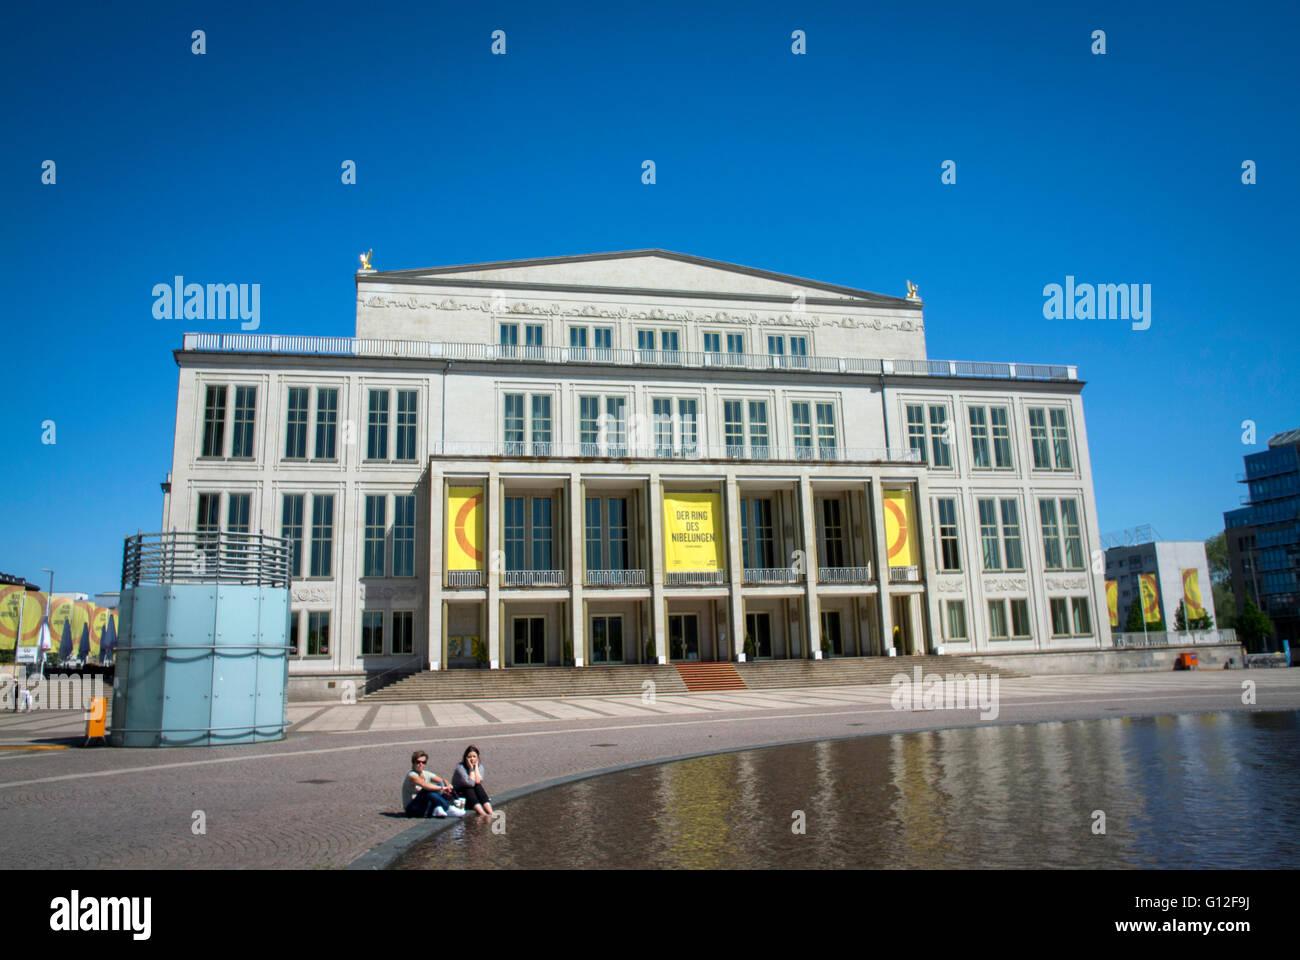 Leipzig Opera House At The Augustusplatz In Leipzig Germany Stock Photo Alamy